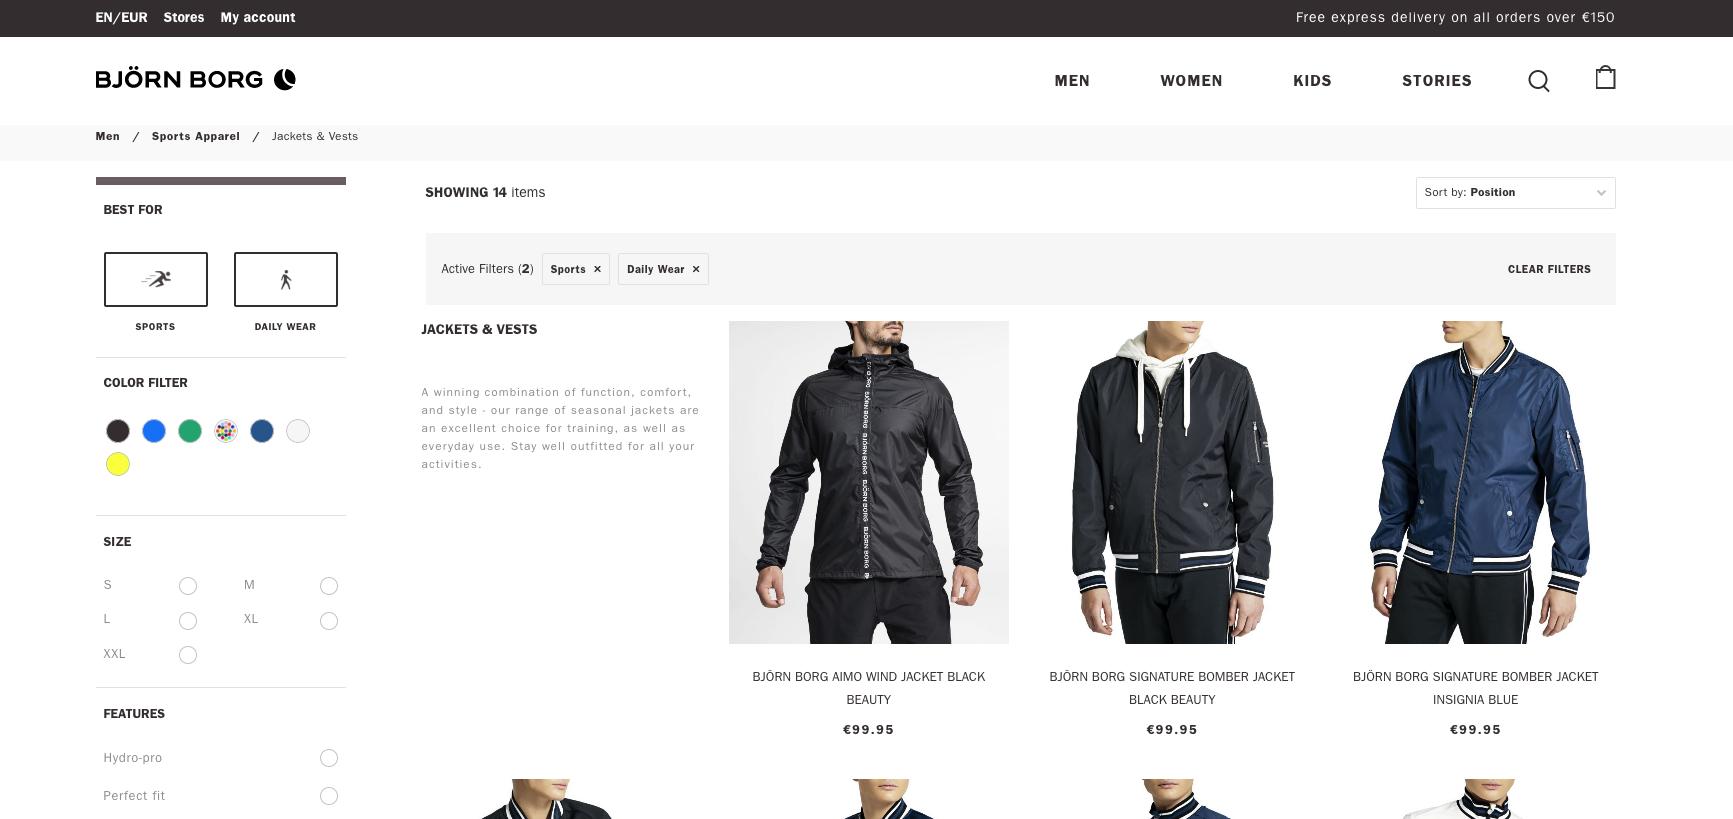 Björn Borg Product Listing